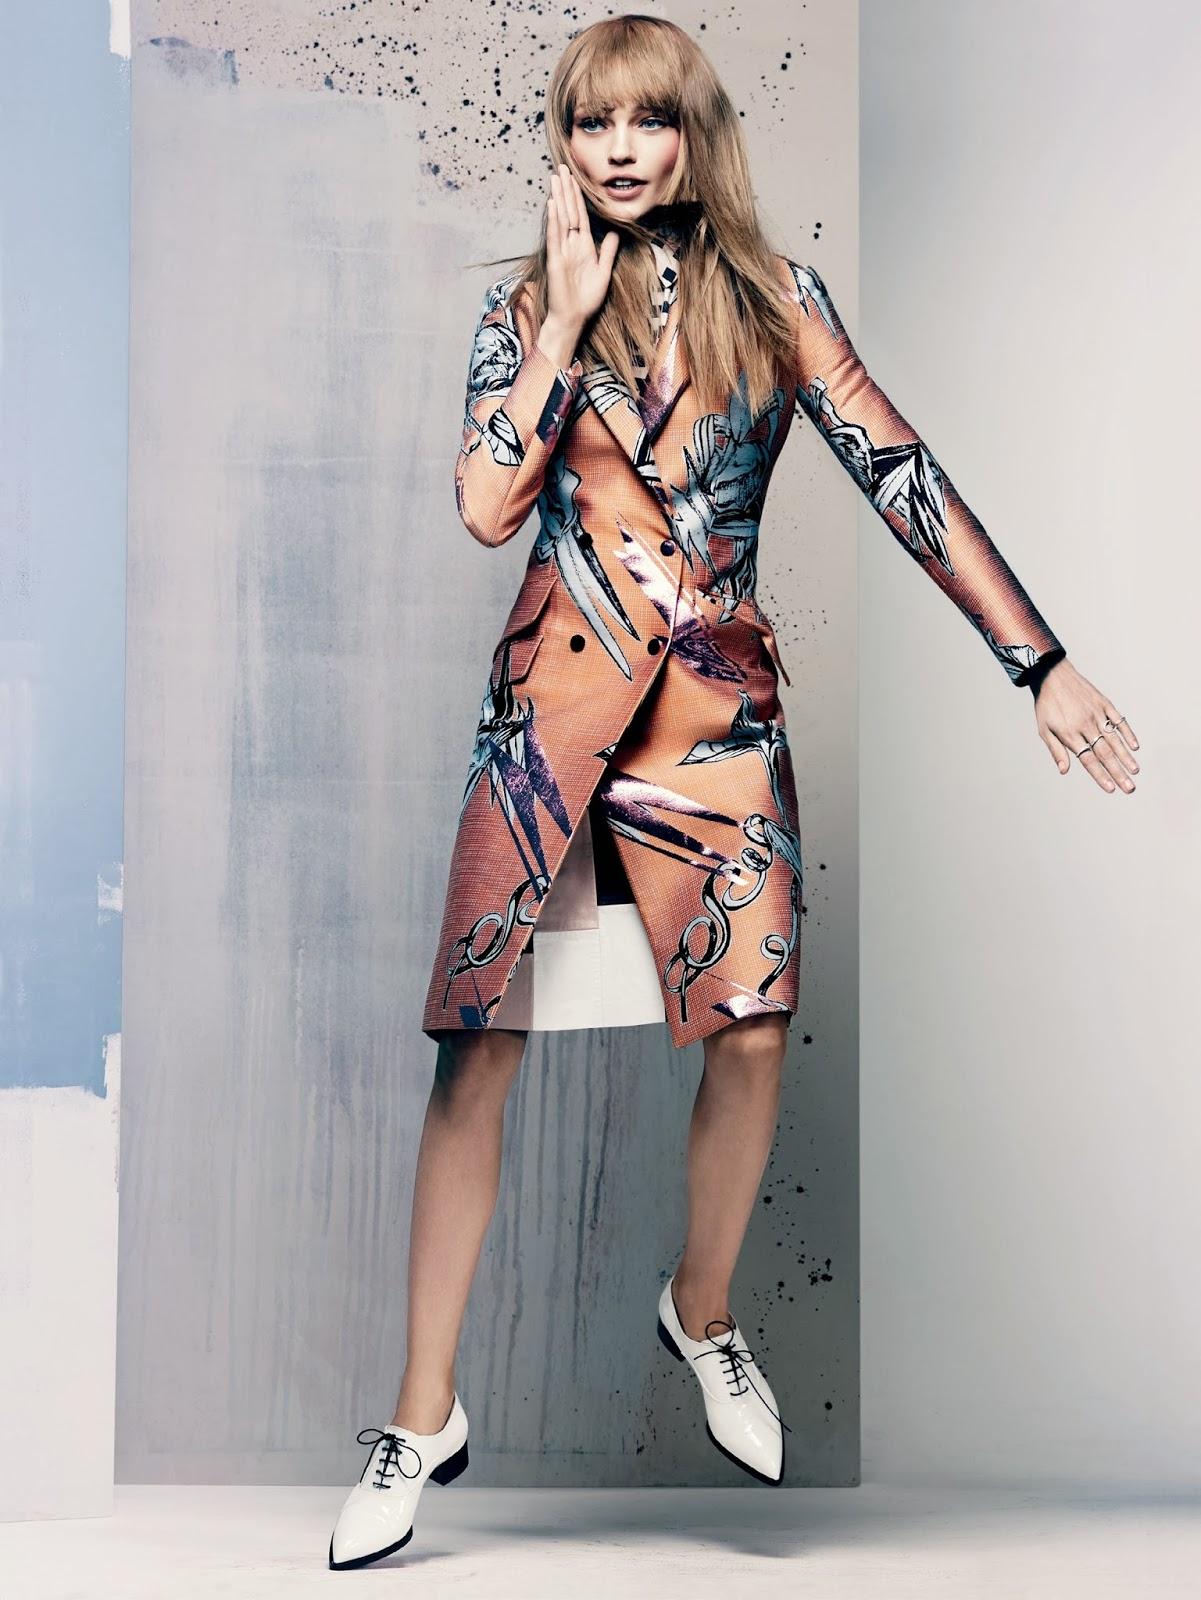 Cool Chic Style Fashion: Fashion Editorial | Sasha ...